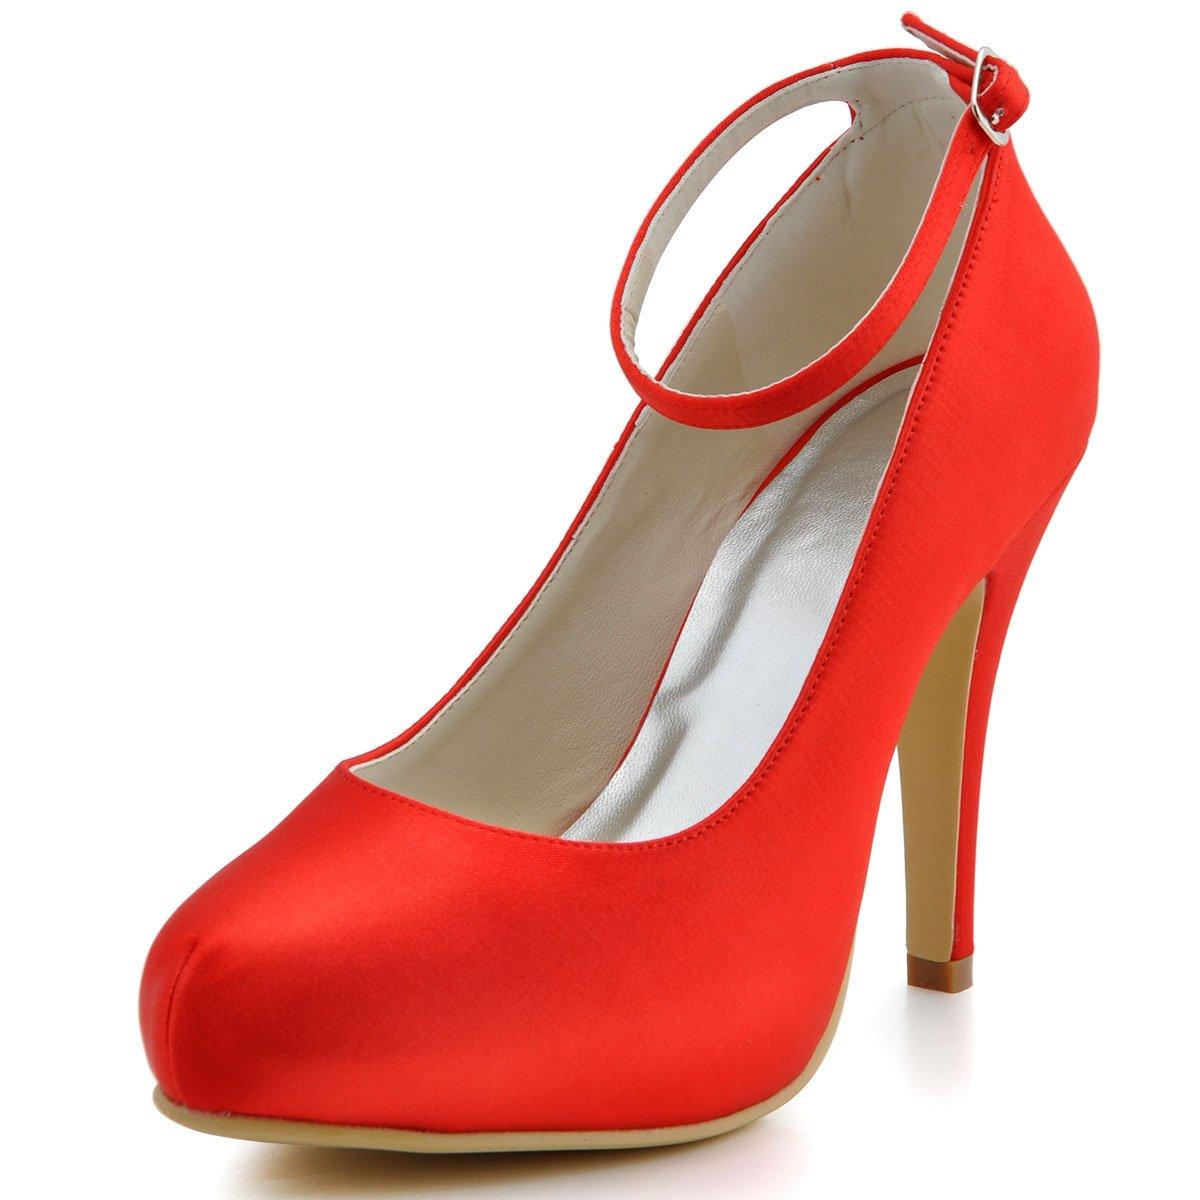 ElegantPark Women Pumps Closed Toe High Heel Platform Ankle Straps Evening Wedding Shoes B00HSHR1P0 8 B(M) US Red